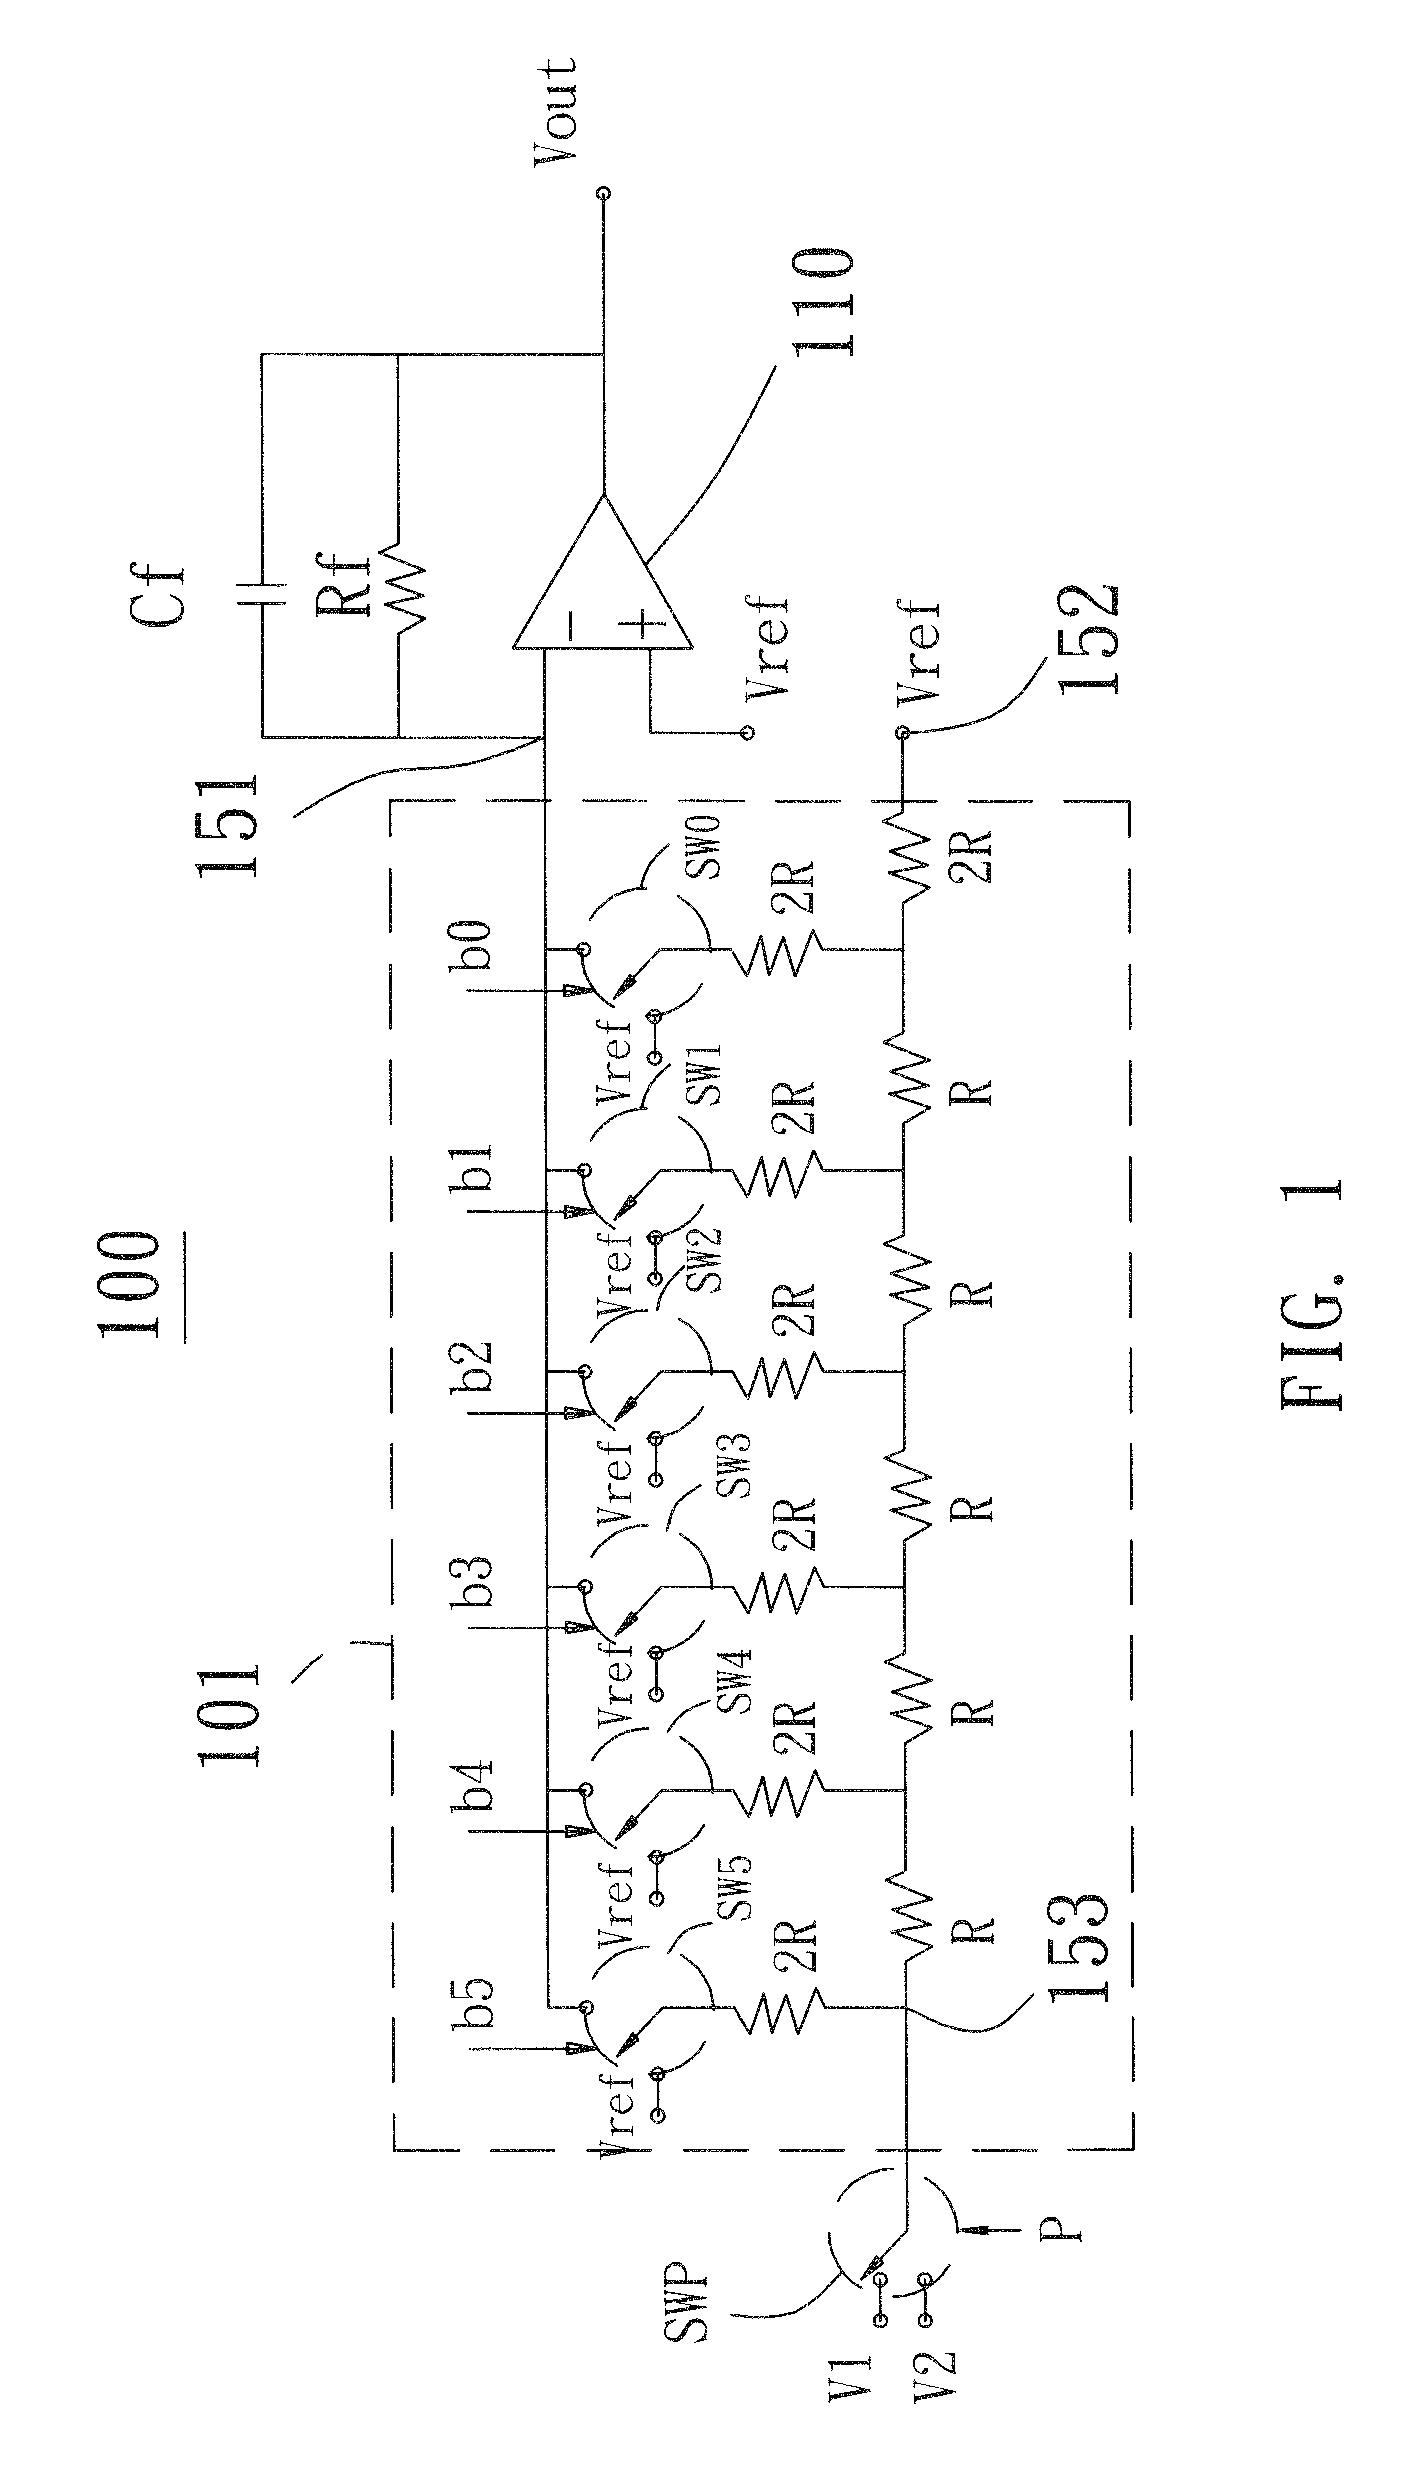 2014 kia soul headlight wiring diagram